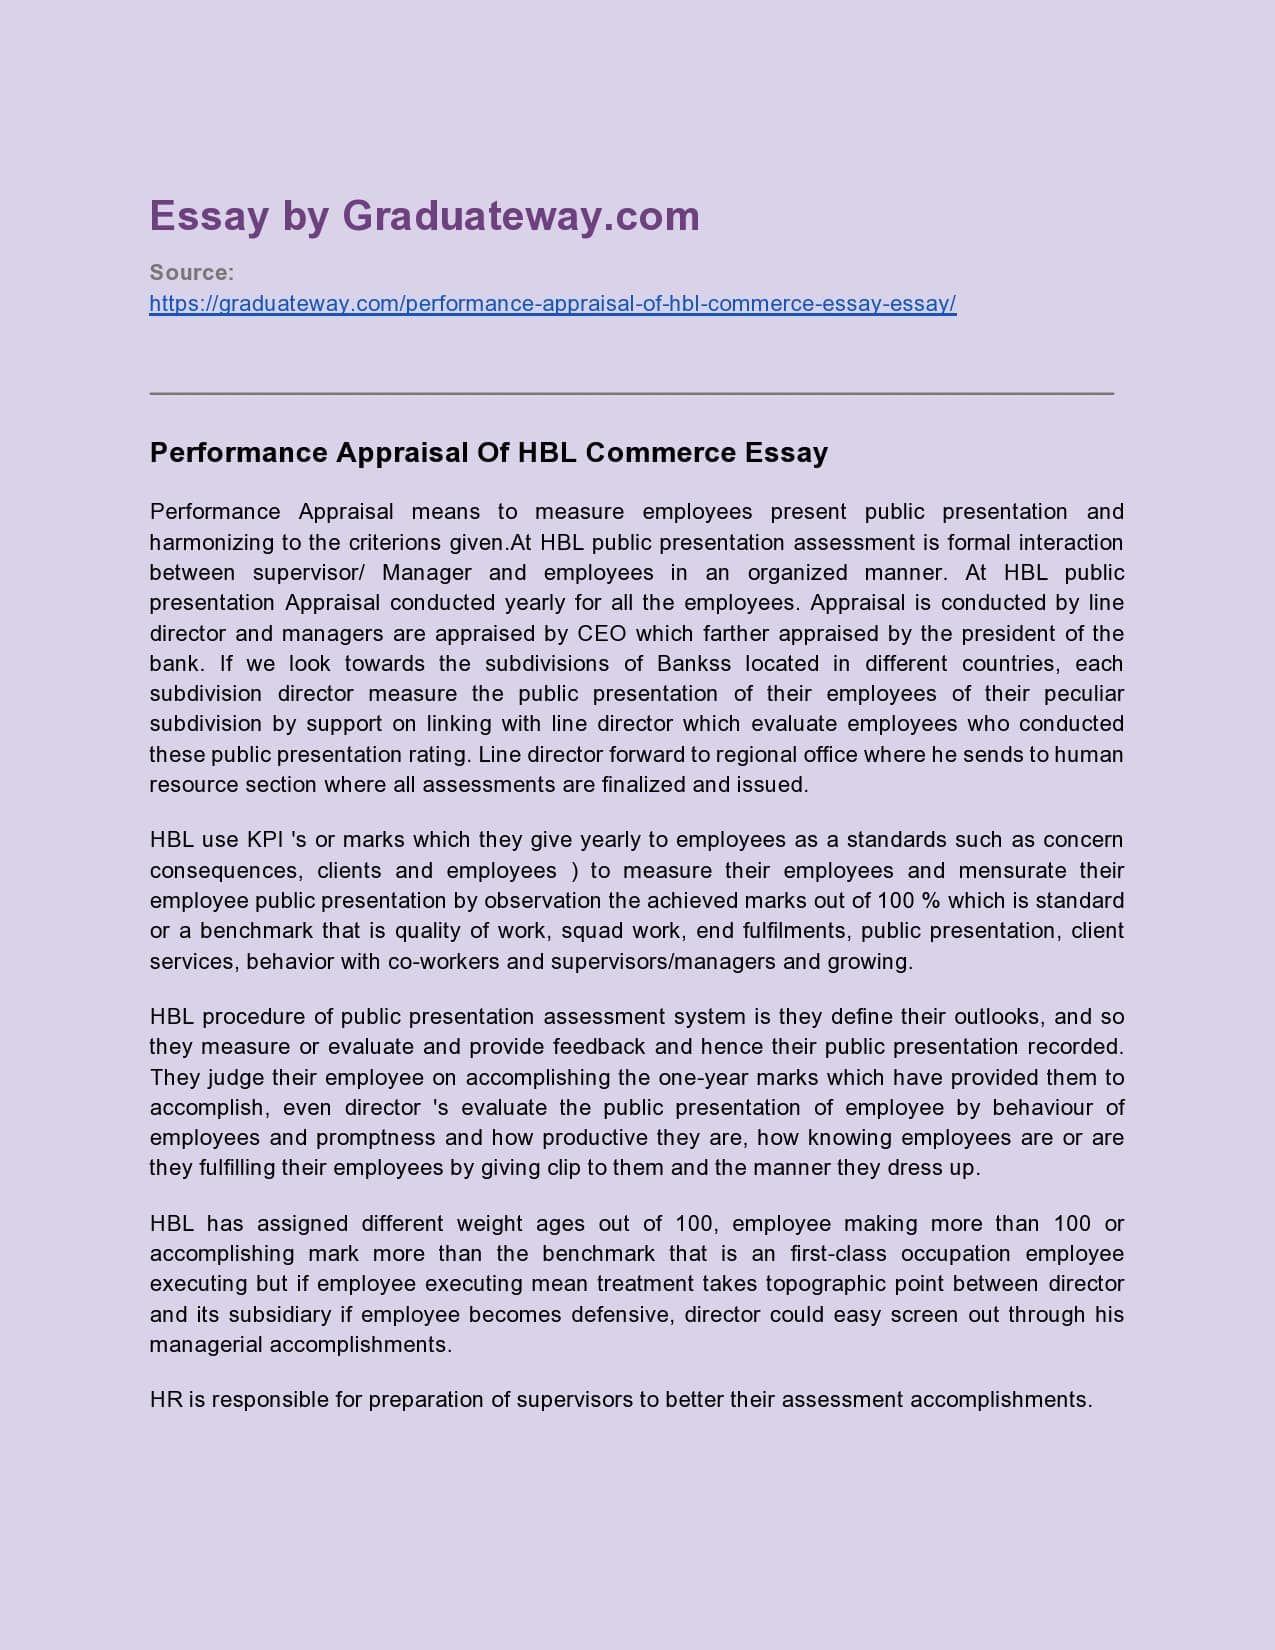 Performance management essay